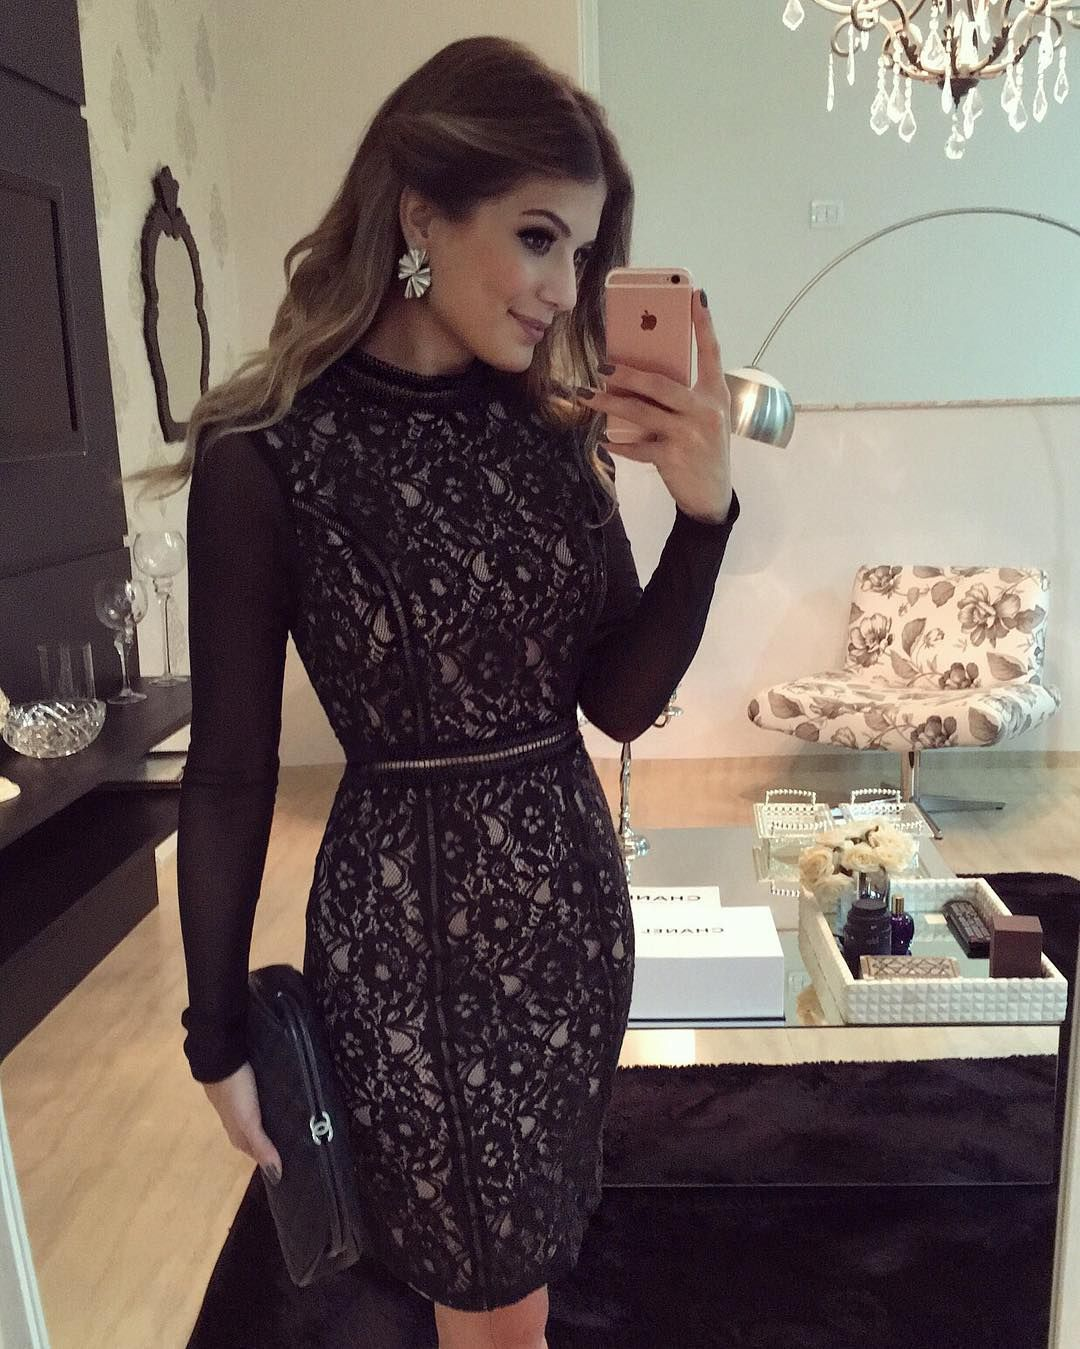 9058472d4 C͟͟o͟͟n͟͟t͟͟a͟͟t͟͟o͟͟  trend-alert hotmail.com Brazilian Fashion Blogger -  São José do Rio Preto SP ➸ Snapchat  aricanovas